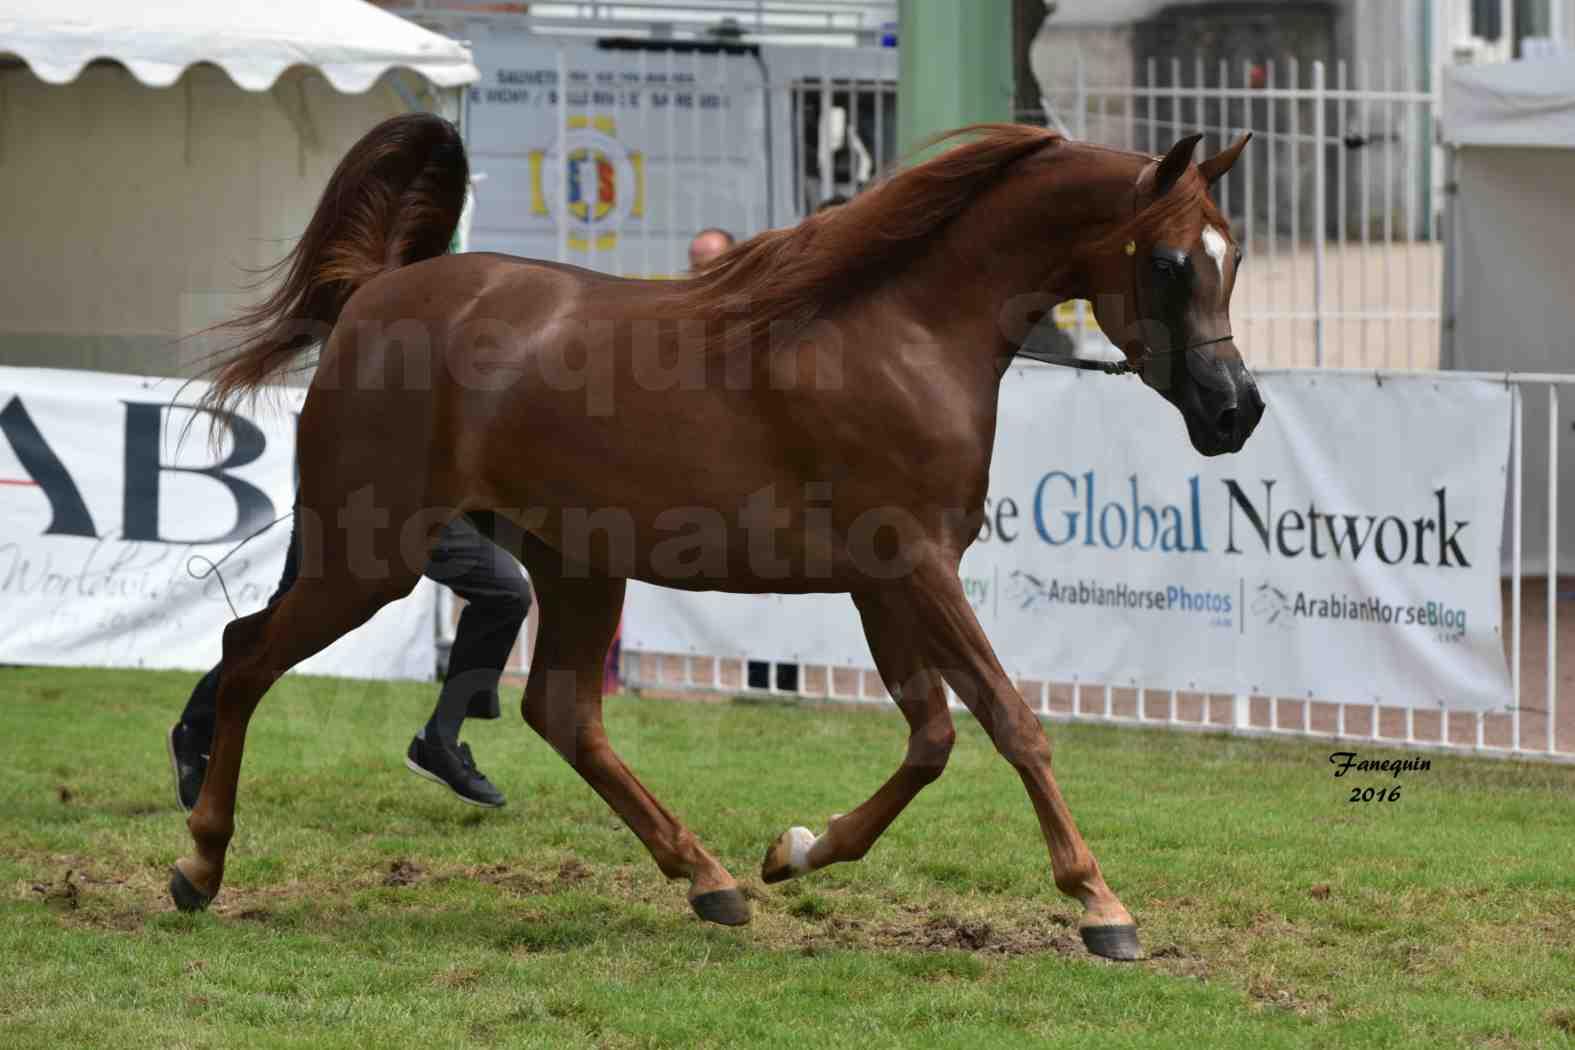 International Arabian Horse Show B de VICHY 2016 - PEARL DE DJOON - Notre Sélection - 26